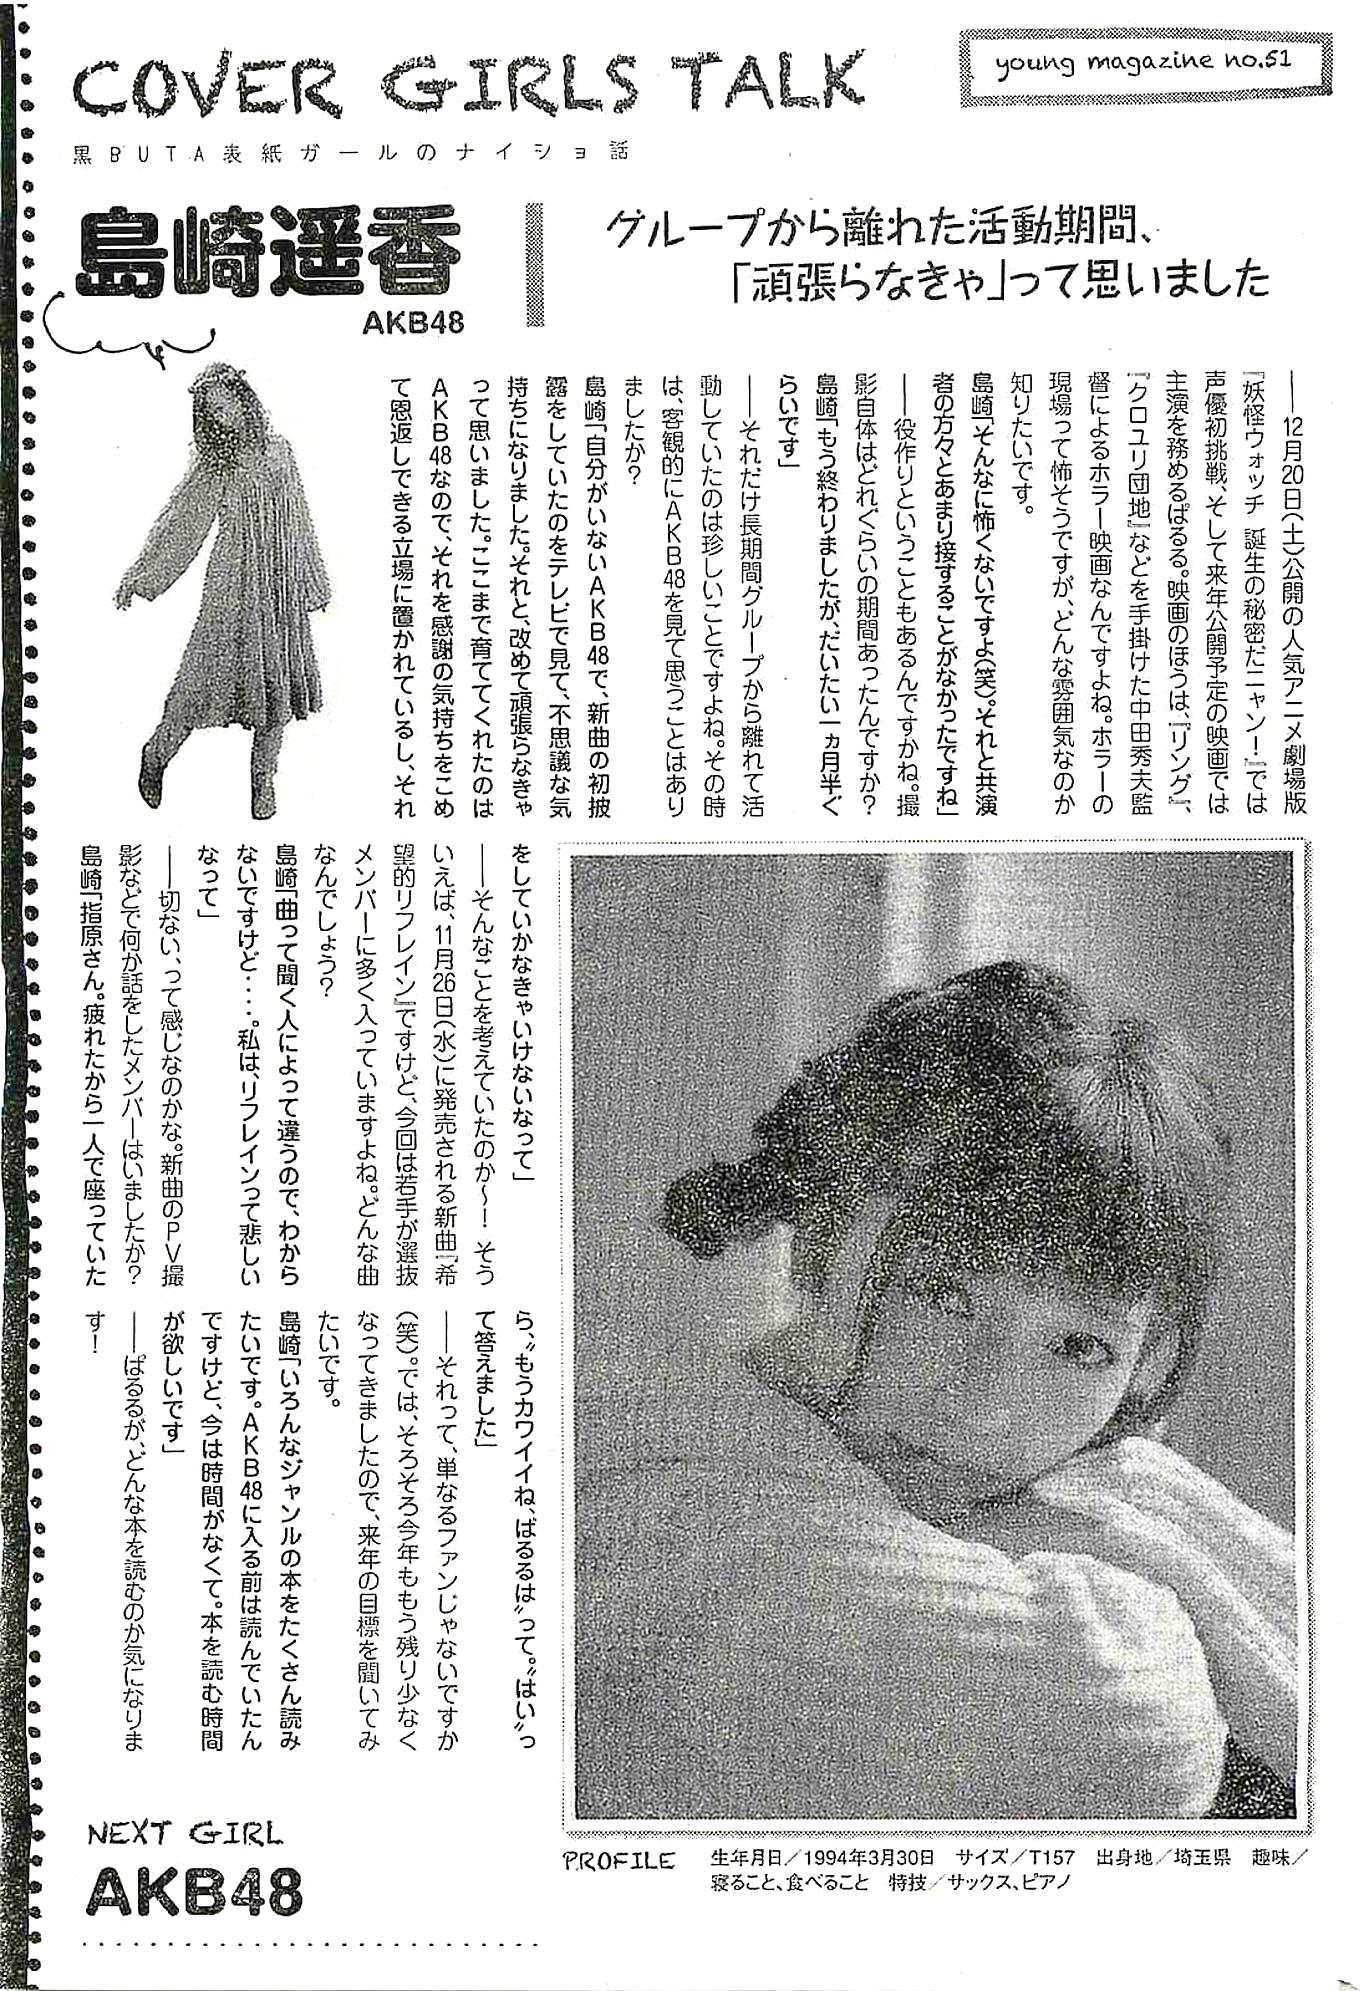 HShimazaki Young Magazine 141201 08.jpg